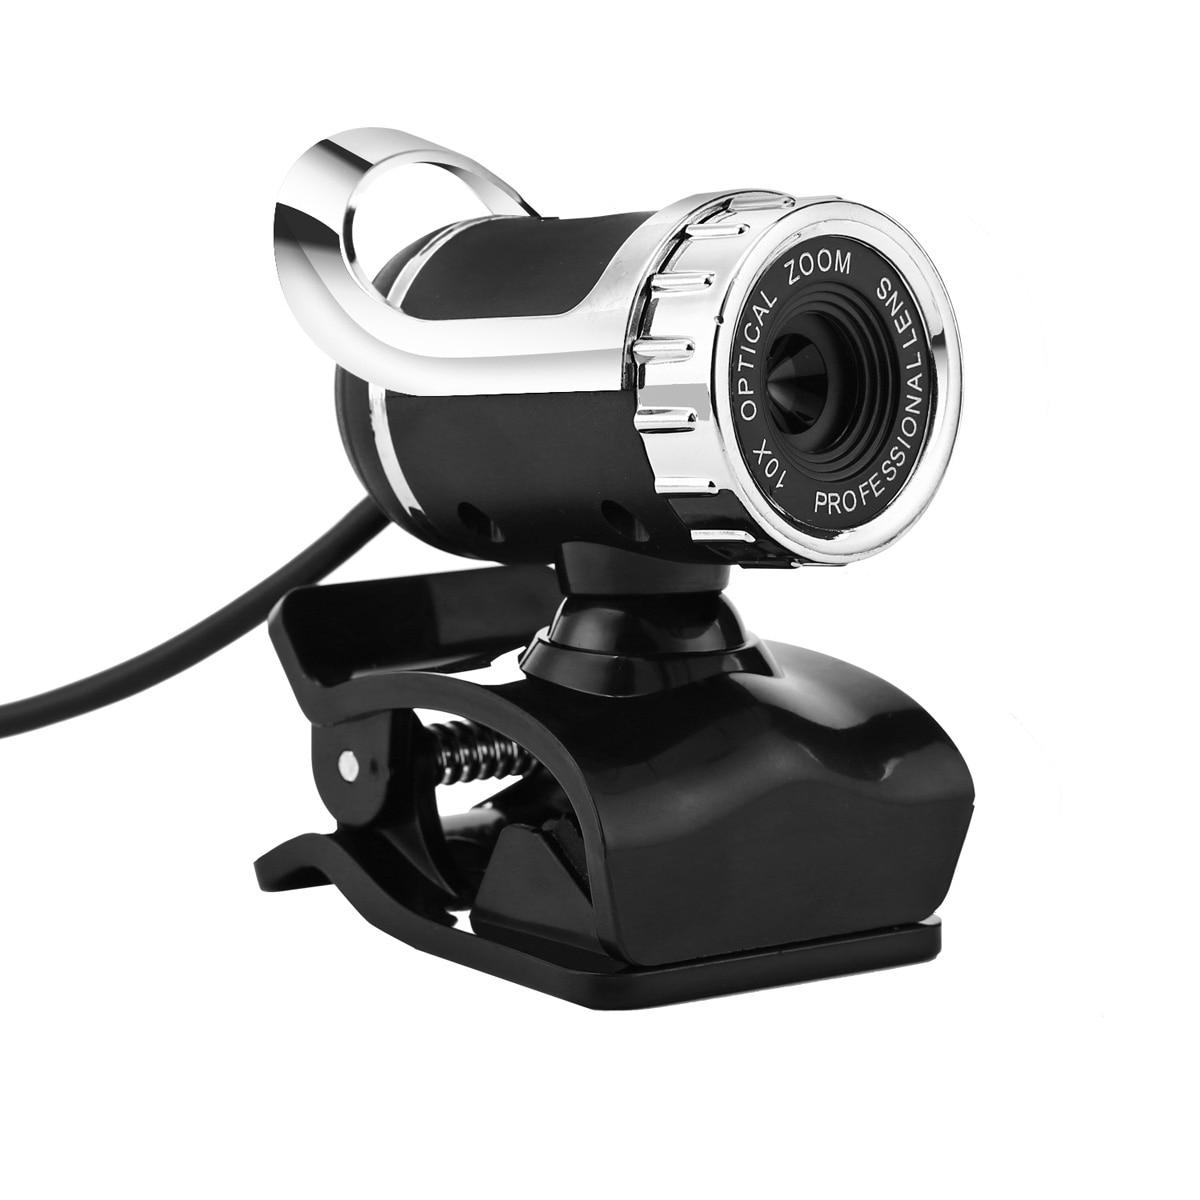 Newest 360 Degree Webcam USB 12 Megapixel HD Camera 2